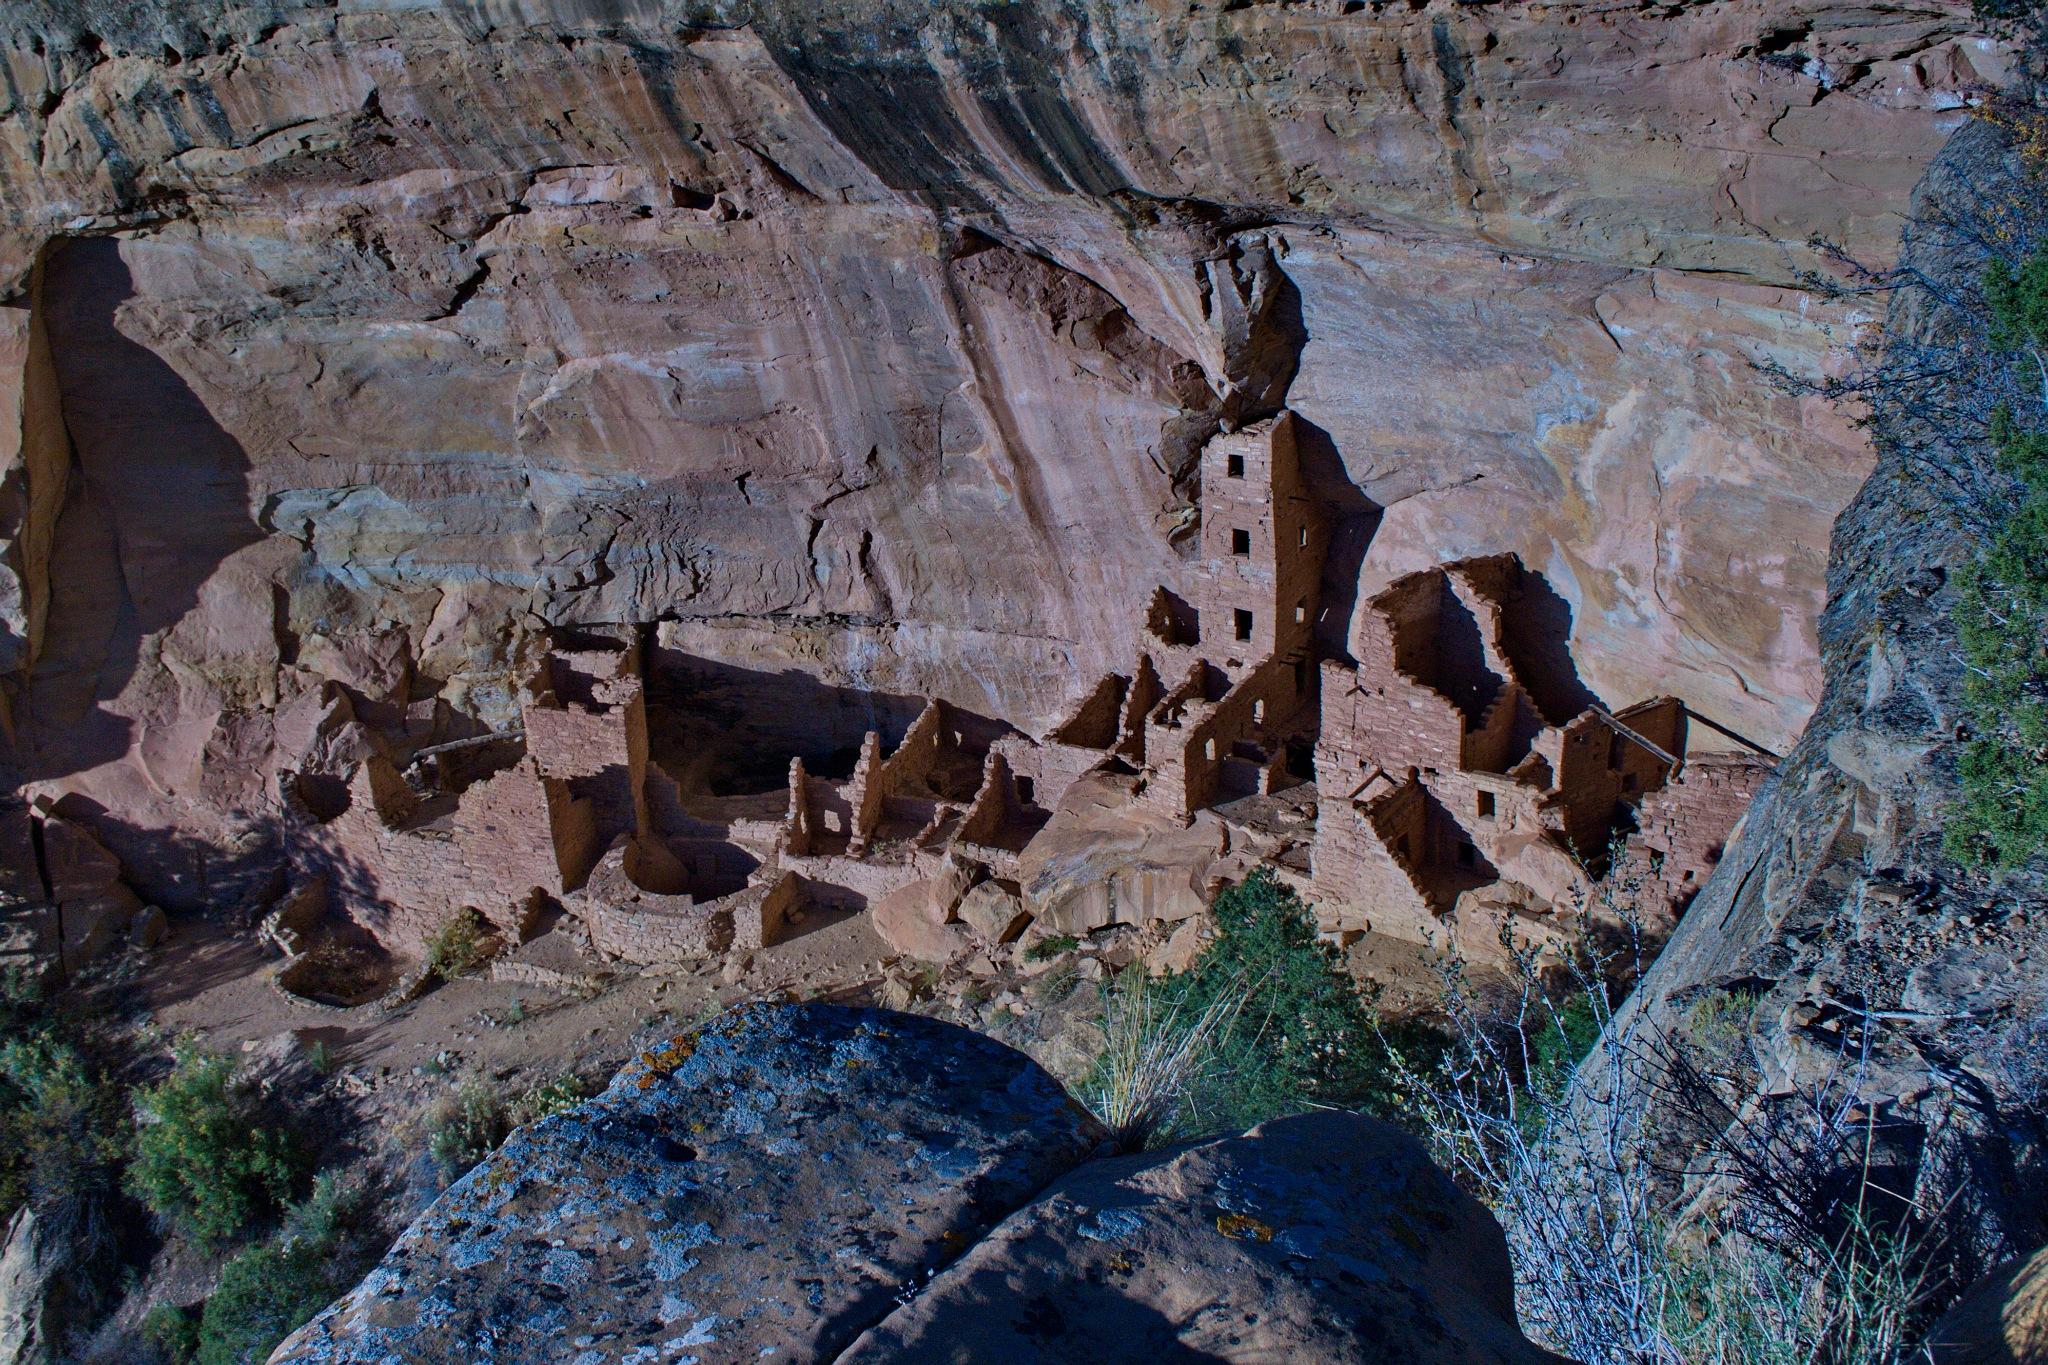 Anasazi Cliff Dwellings by daniel.luna.77920